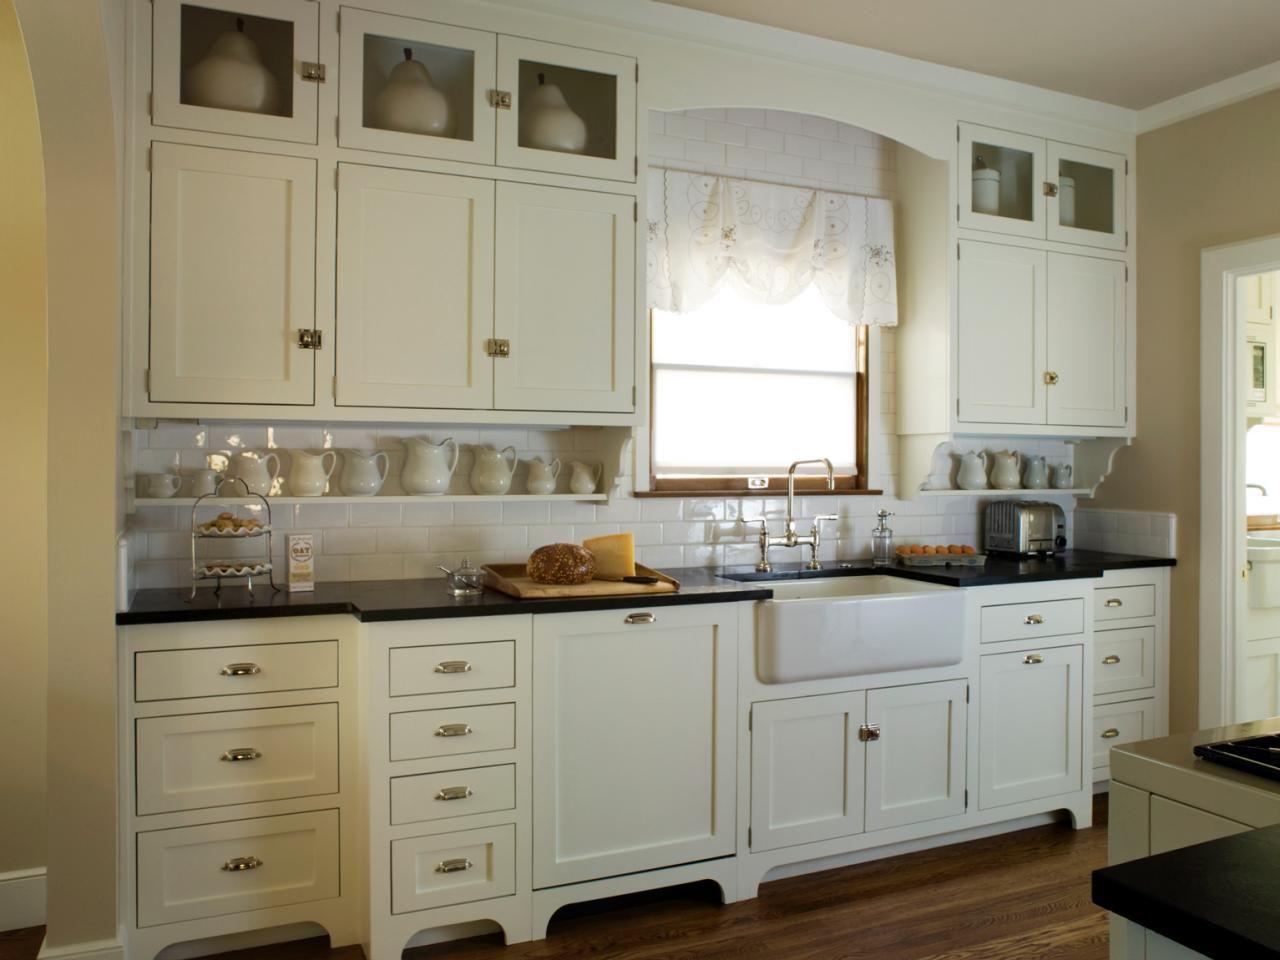 Antique White Shaker Kitchen Cabinets Antique White Kitchen